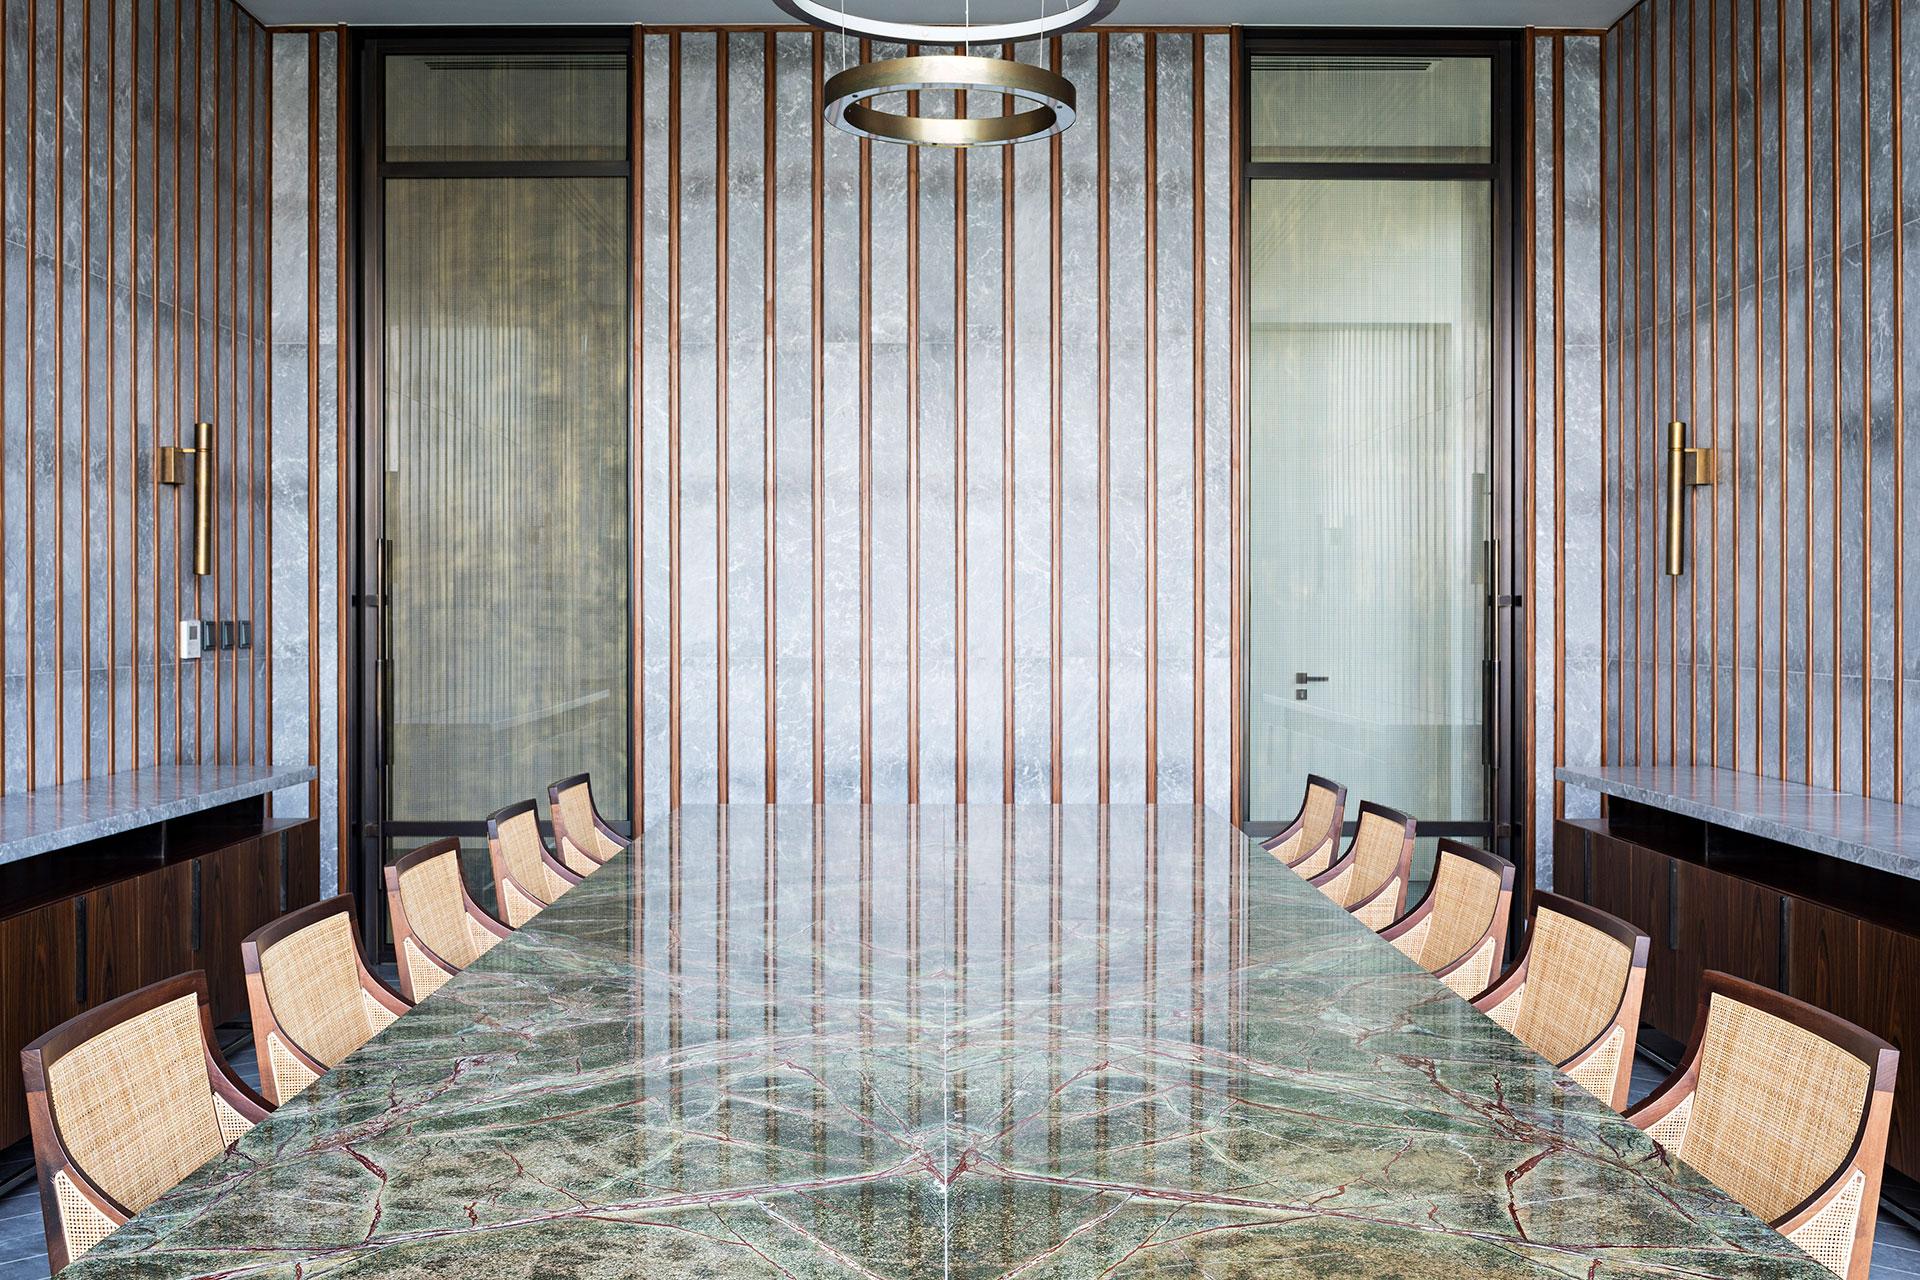 DUB5-AMAR-SABEH-Architecture-Studio-Palm-villa-Dubai-2018-©Yann-Deret-8368.jpg